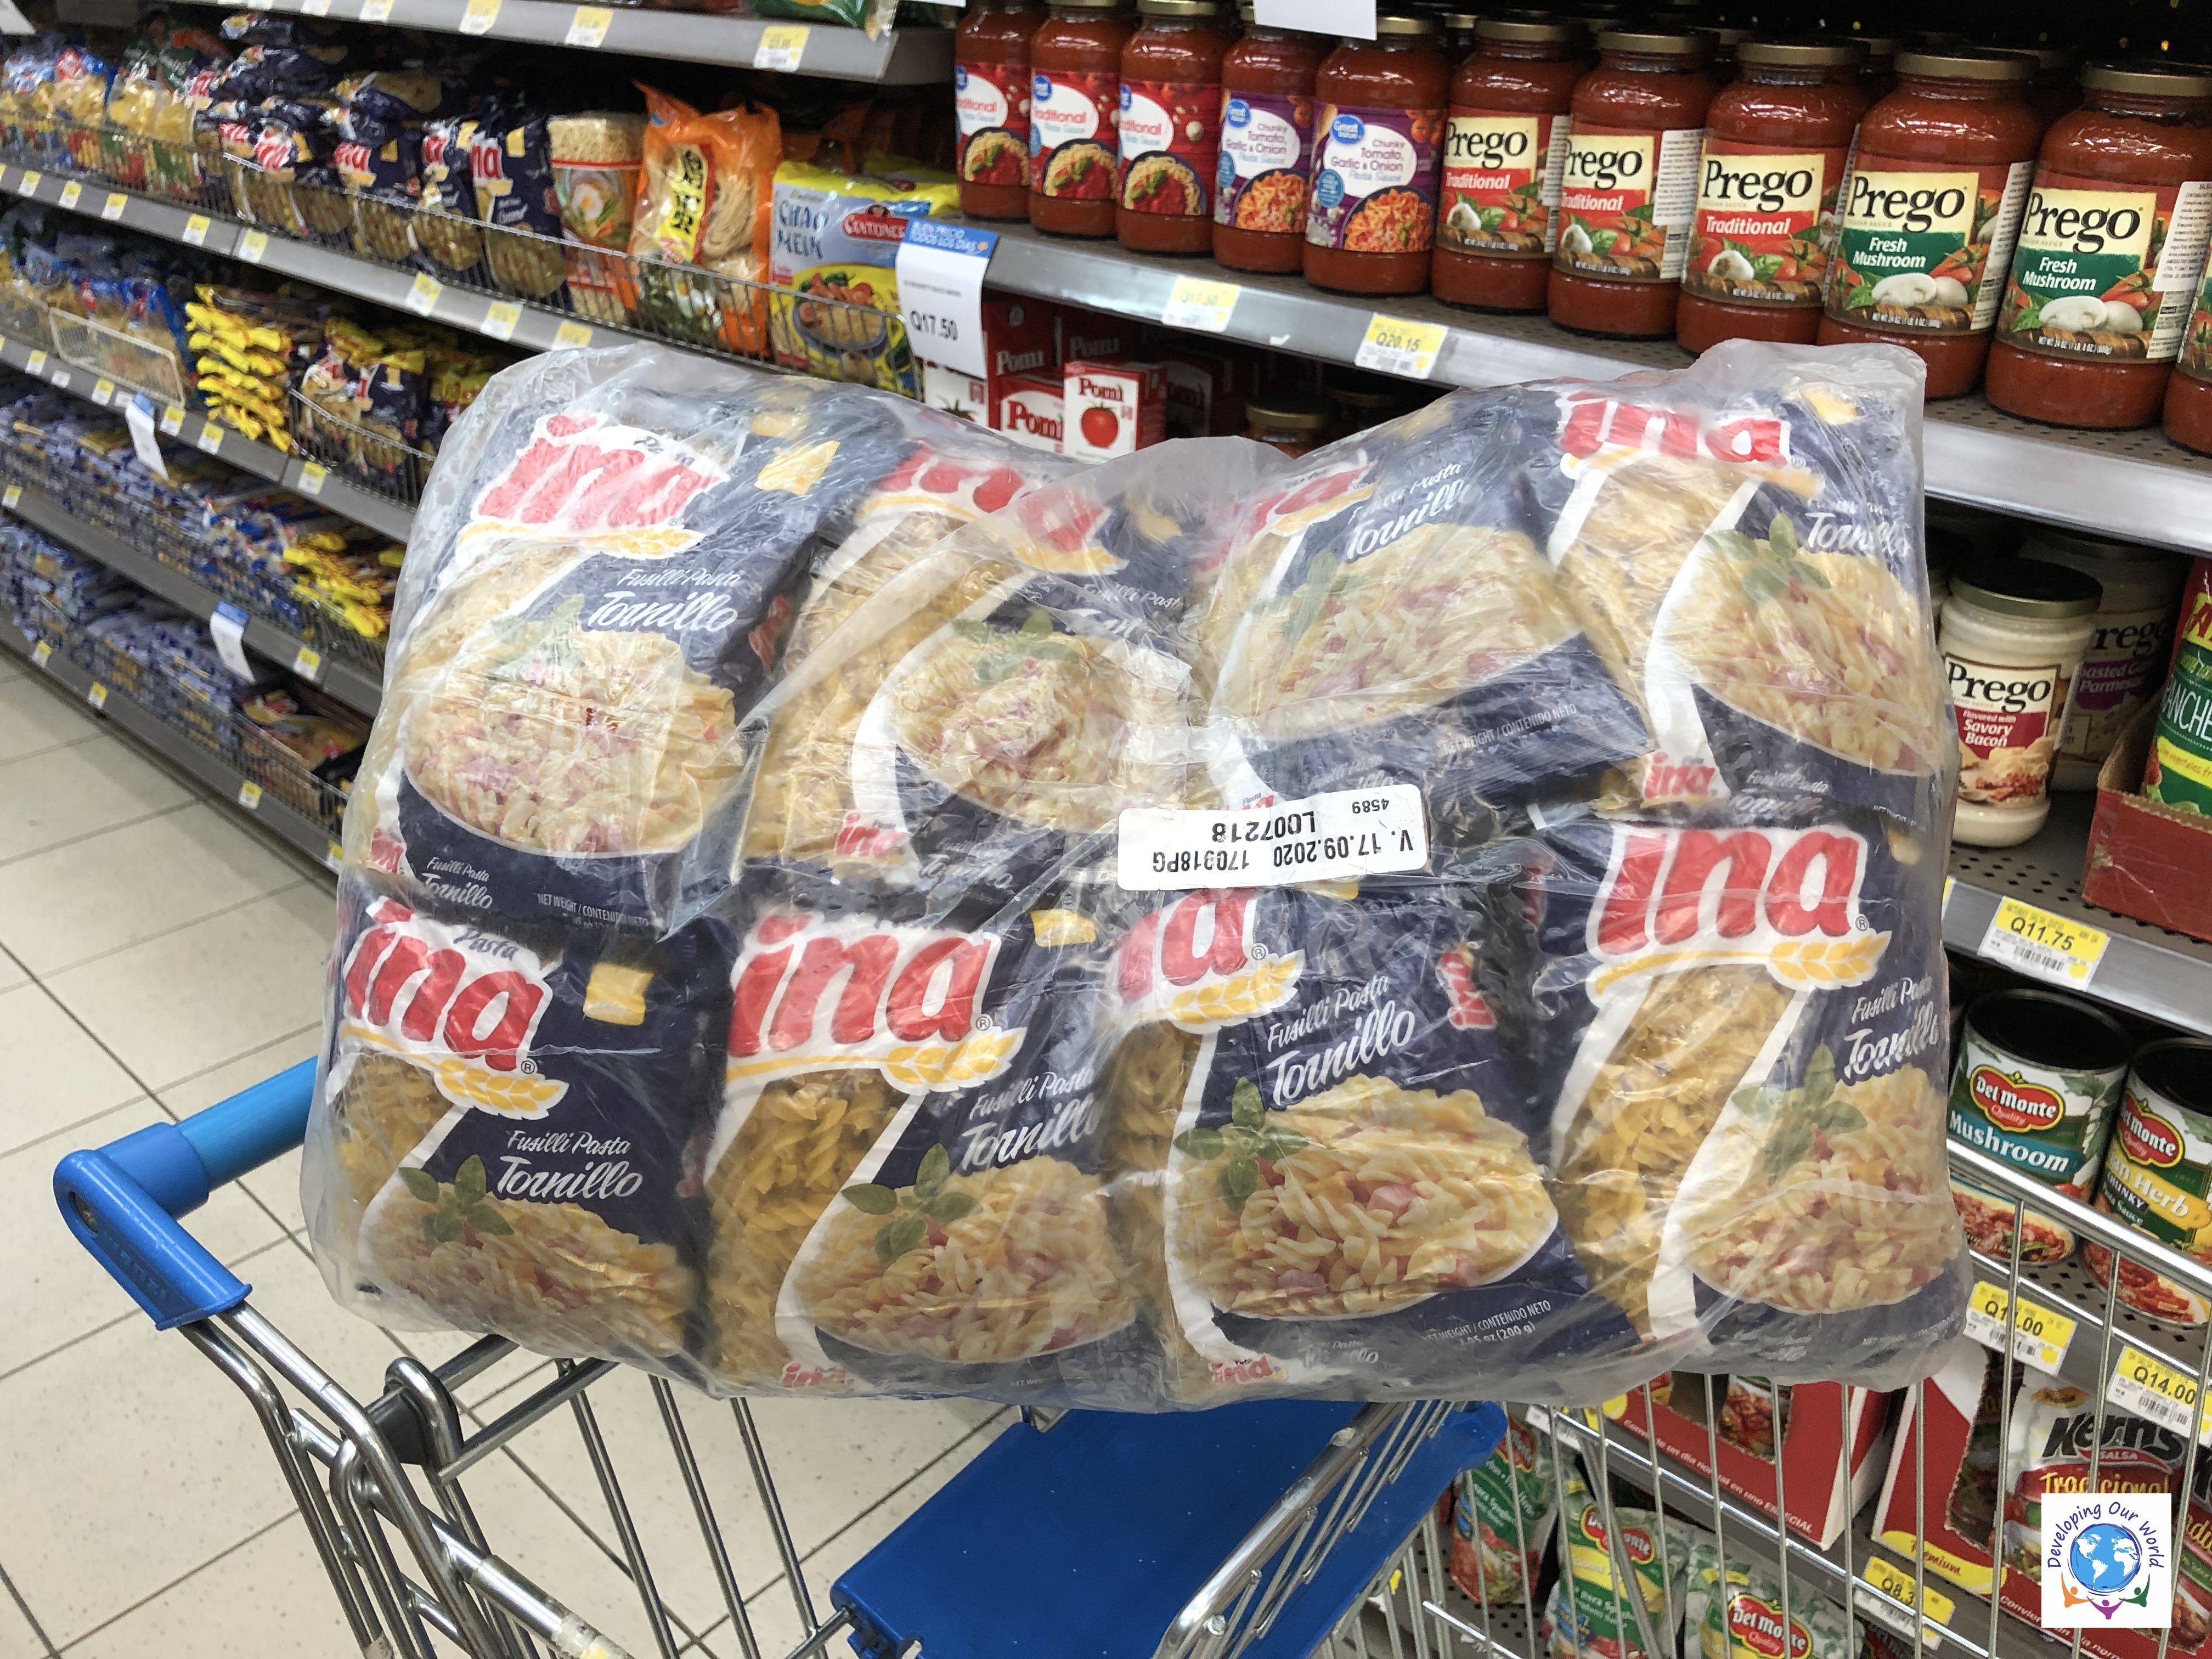 48 lbs of pasta